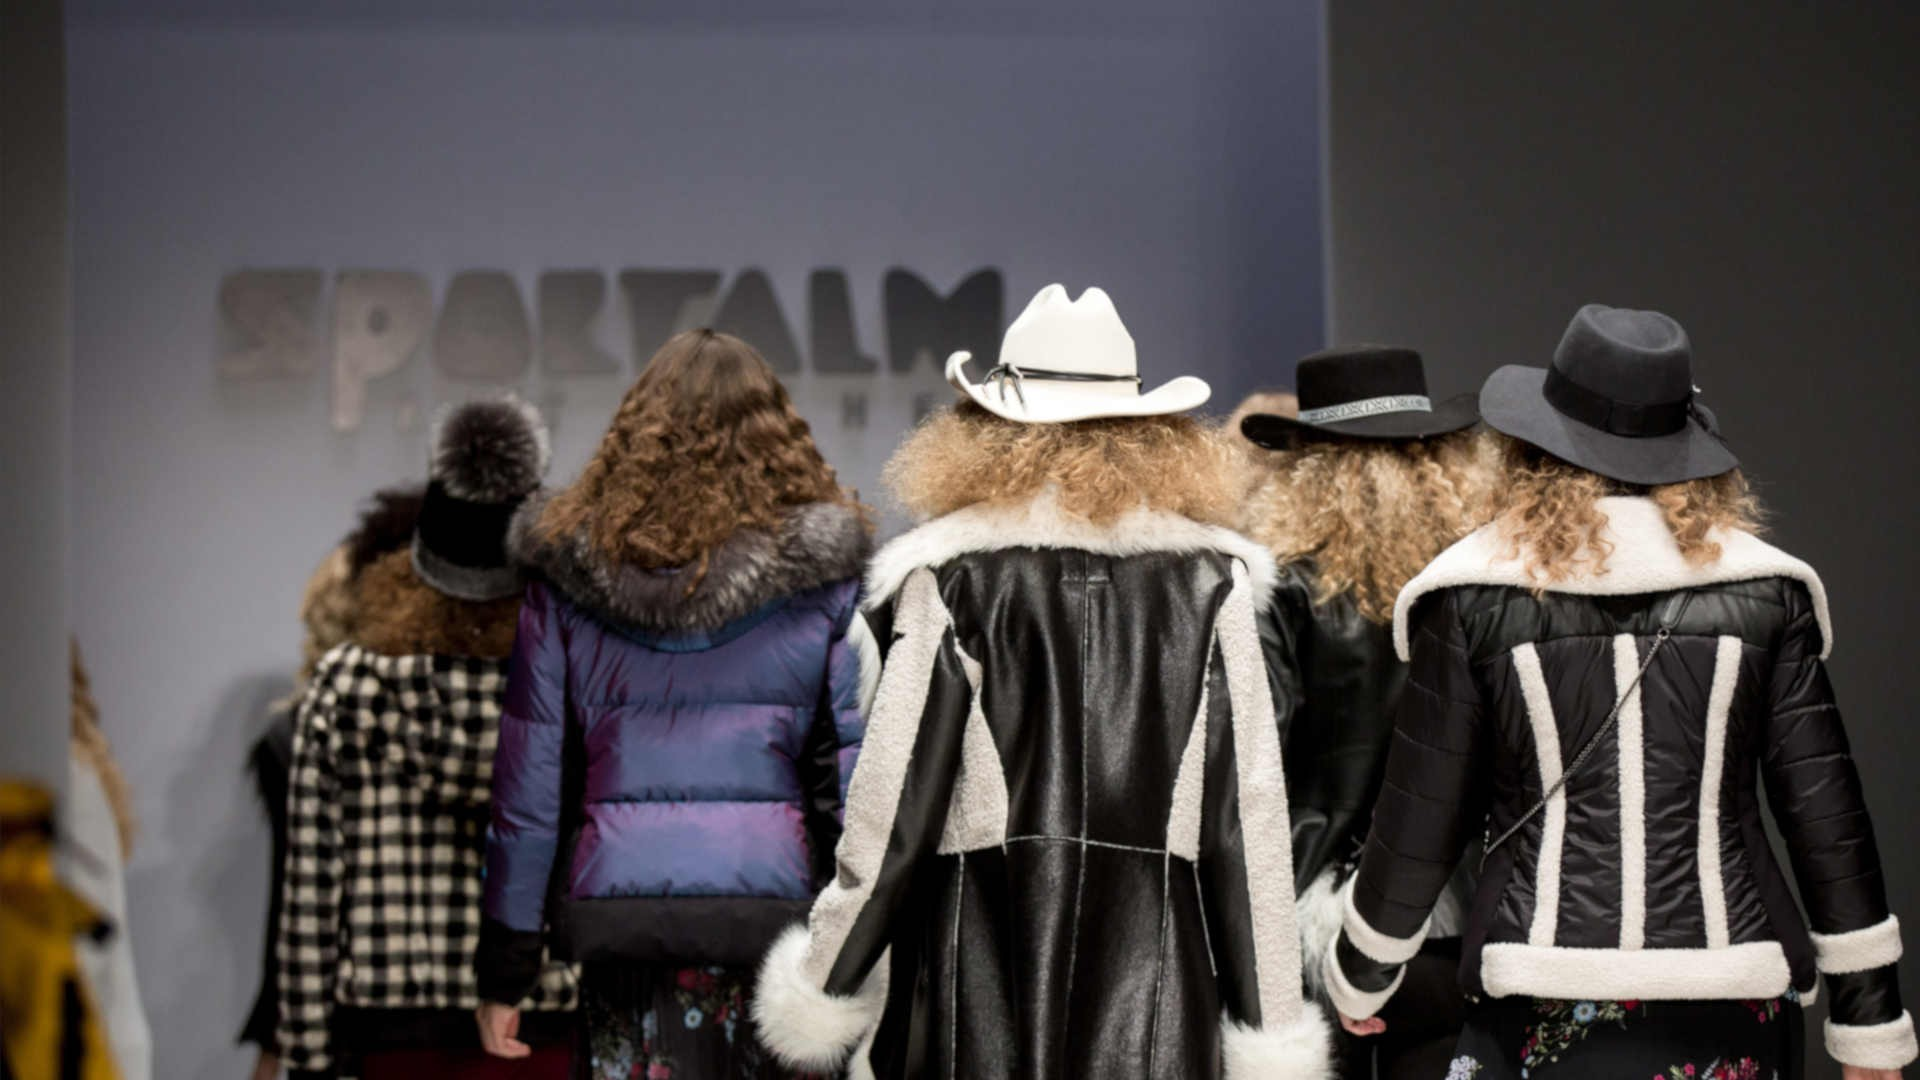 Beauty-Expert-Mercedes-Benz-Fashion-Week-Berlin-Ark-Argenta-7